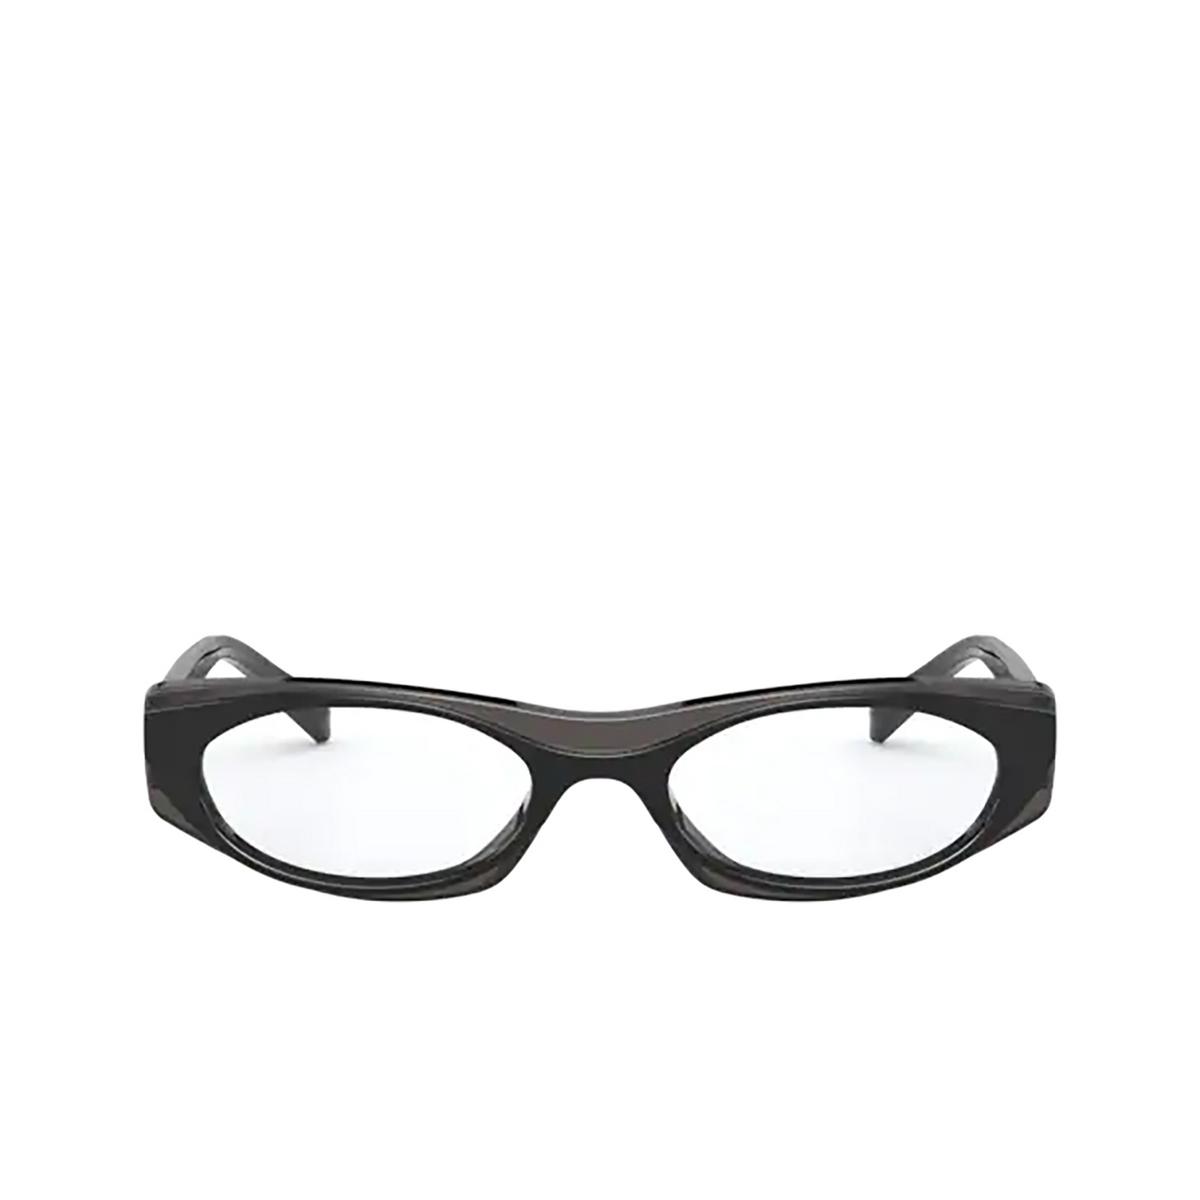 Vogue® Oval Eyeglasses: VO5316 color Top Black / Opal Black 2813 - front view.